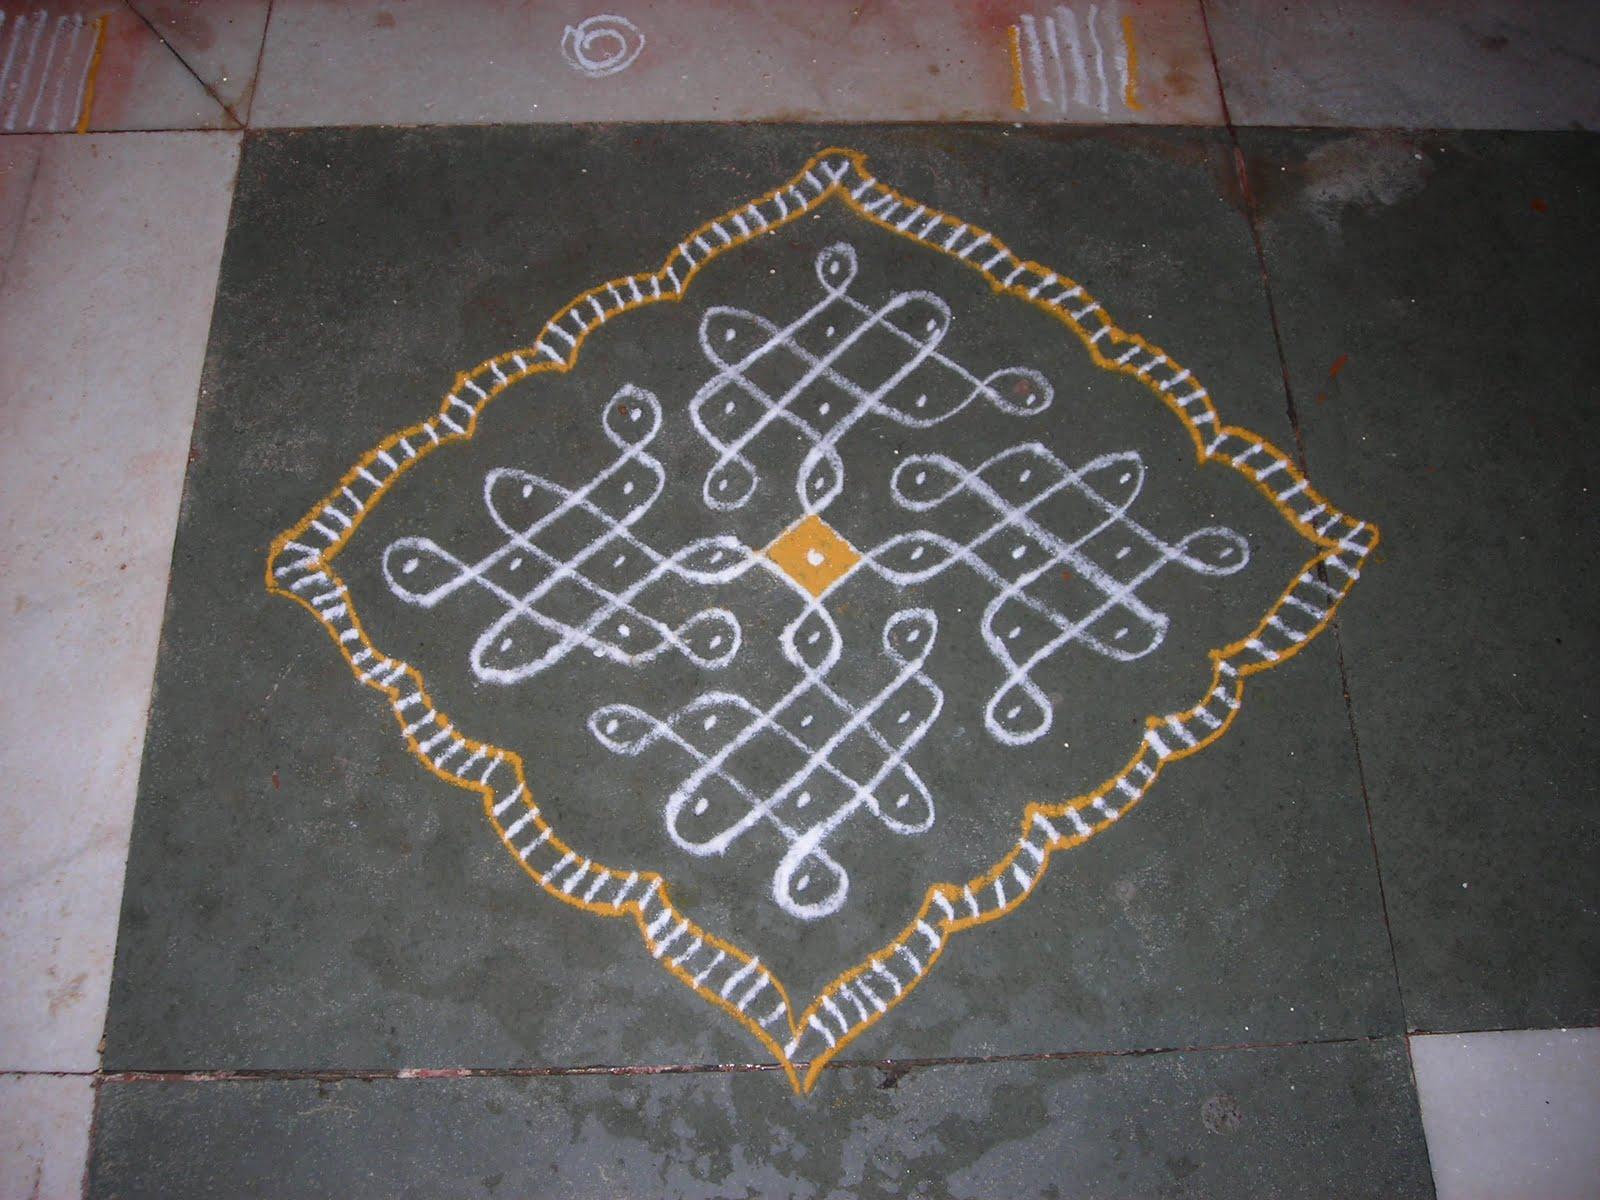 Simple kolam with dots | rangoli kolam designs with /sans dots, The